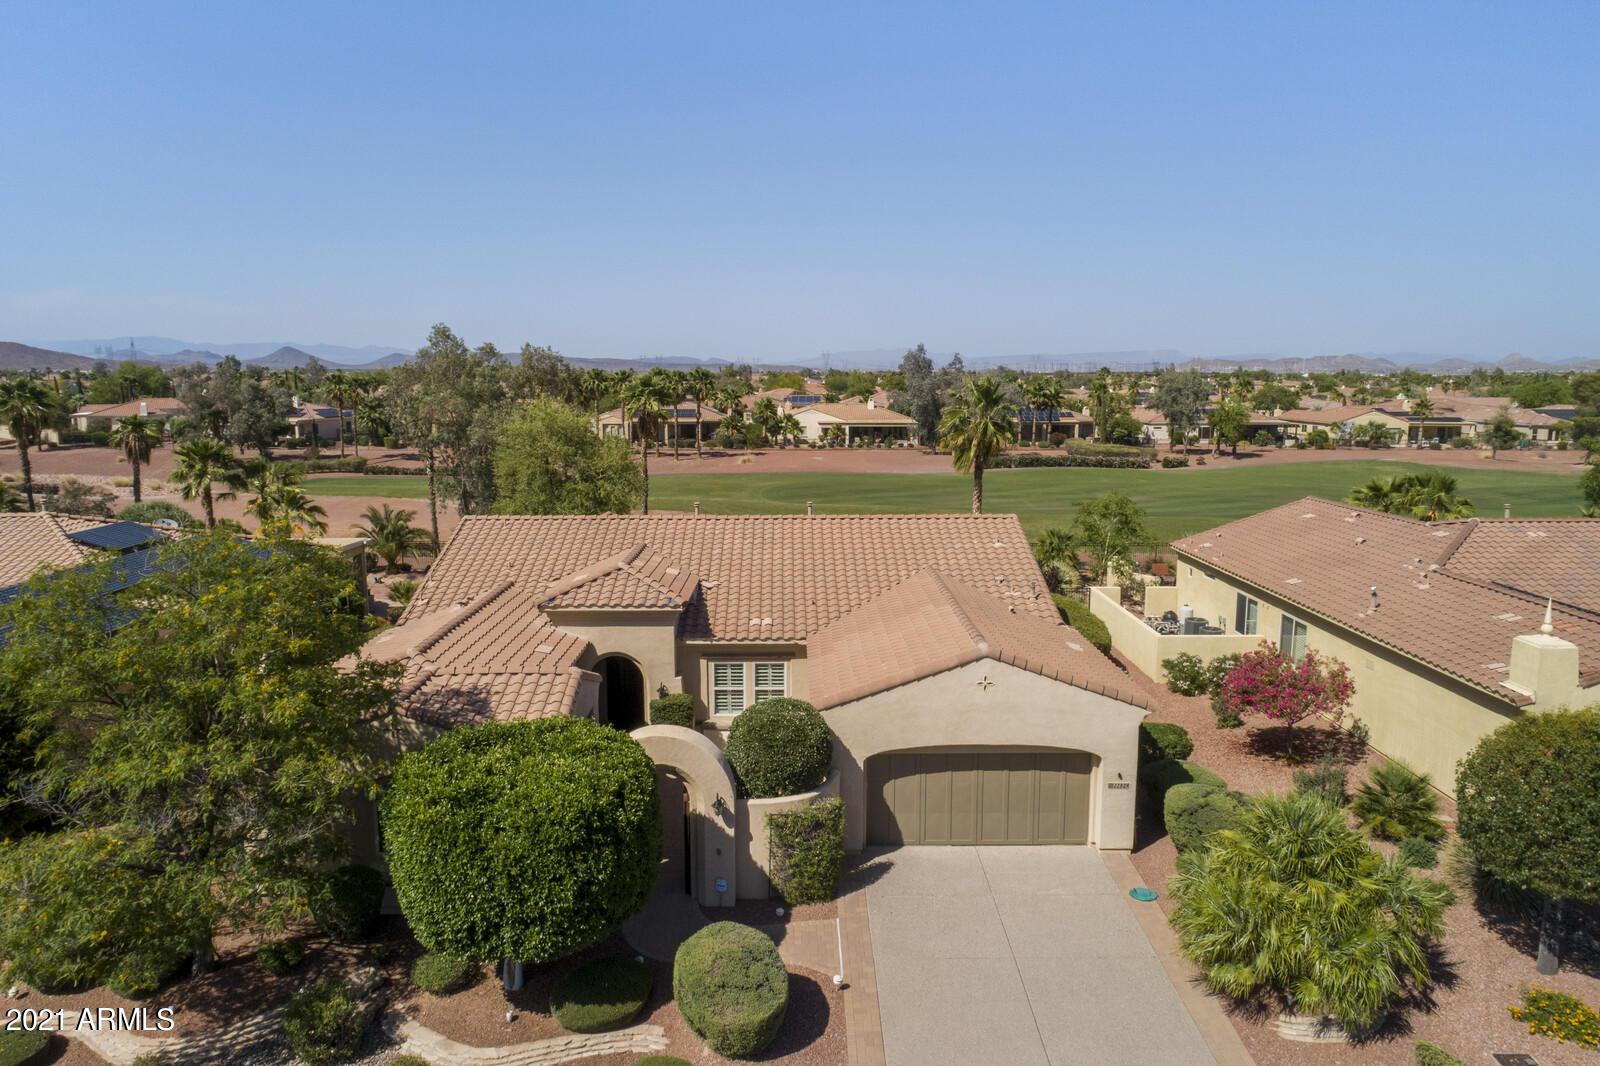 22529 PADARO Drive, Sun City West, Arizona 85375, 3 Bedrooms Bedrooms, ,3.5 BathroomsBathrooms,Residential,For Sale,PADARO,6234569